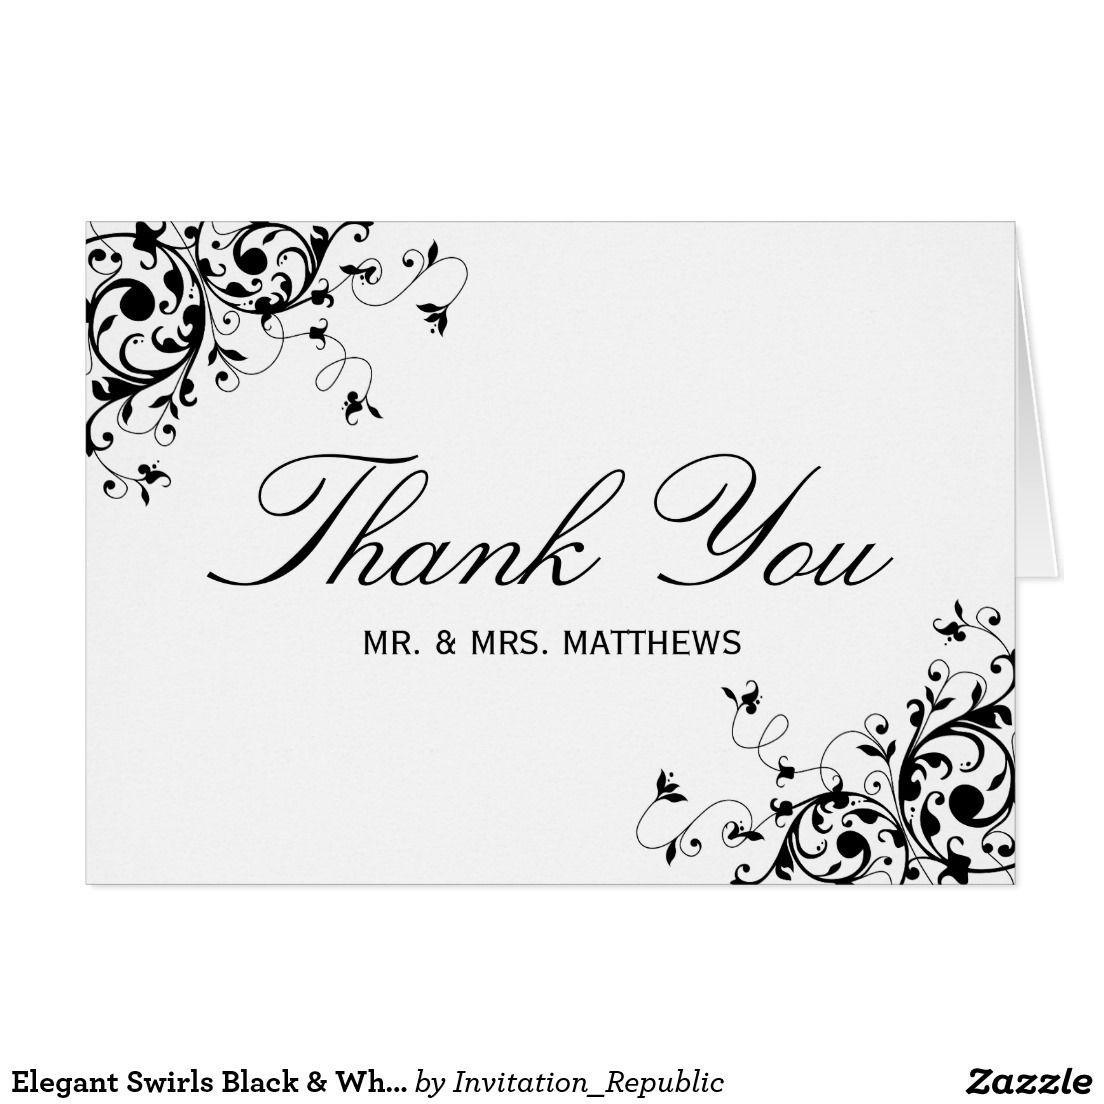 Create Your Own Card Zazzle Com Wedding Thank You Cards Wedding Thank You Wedding Cards